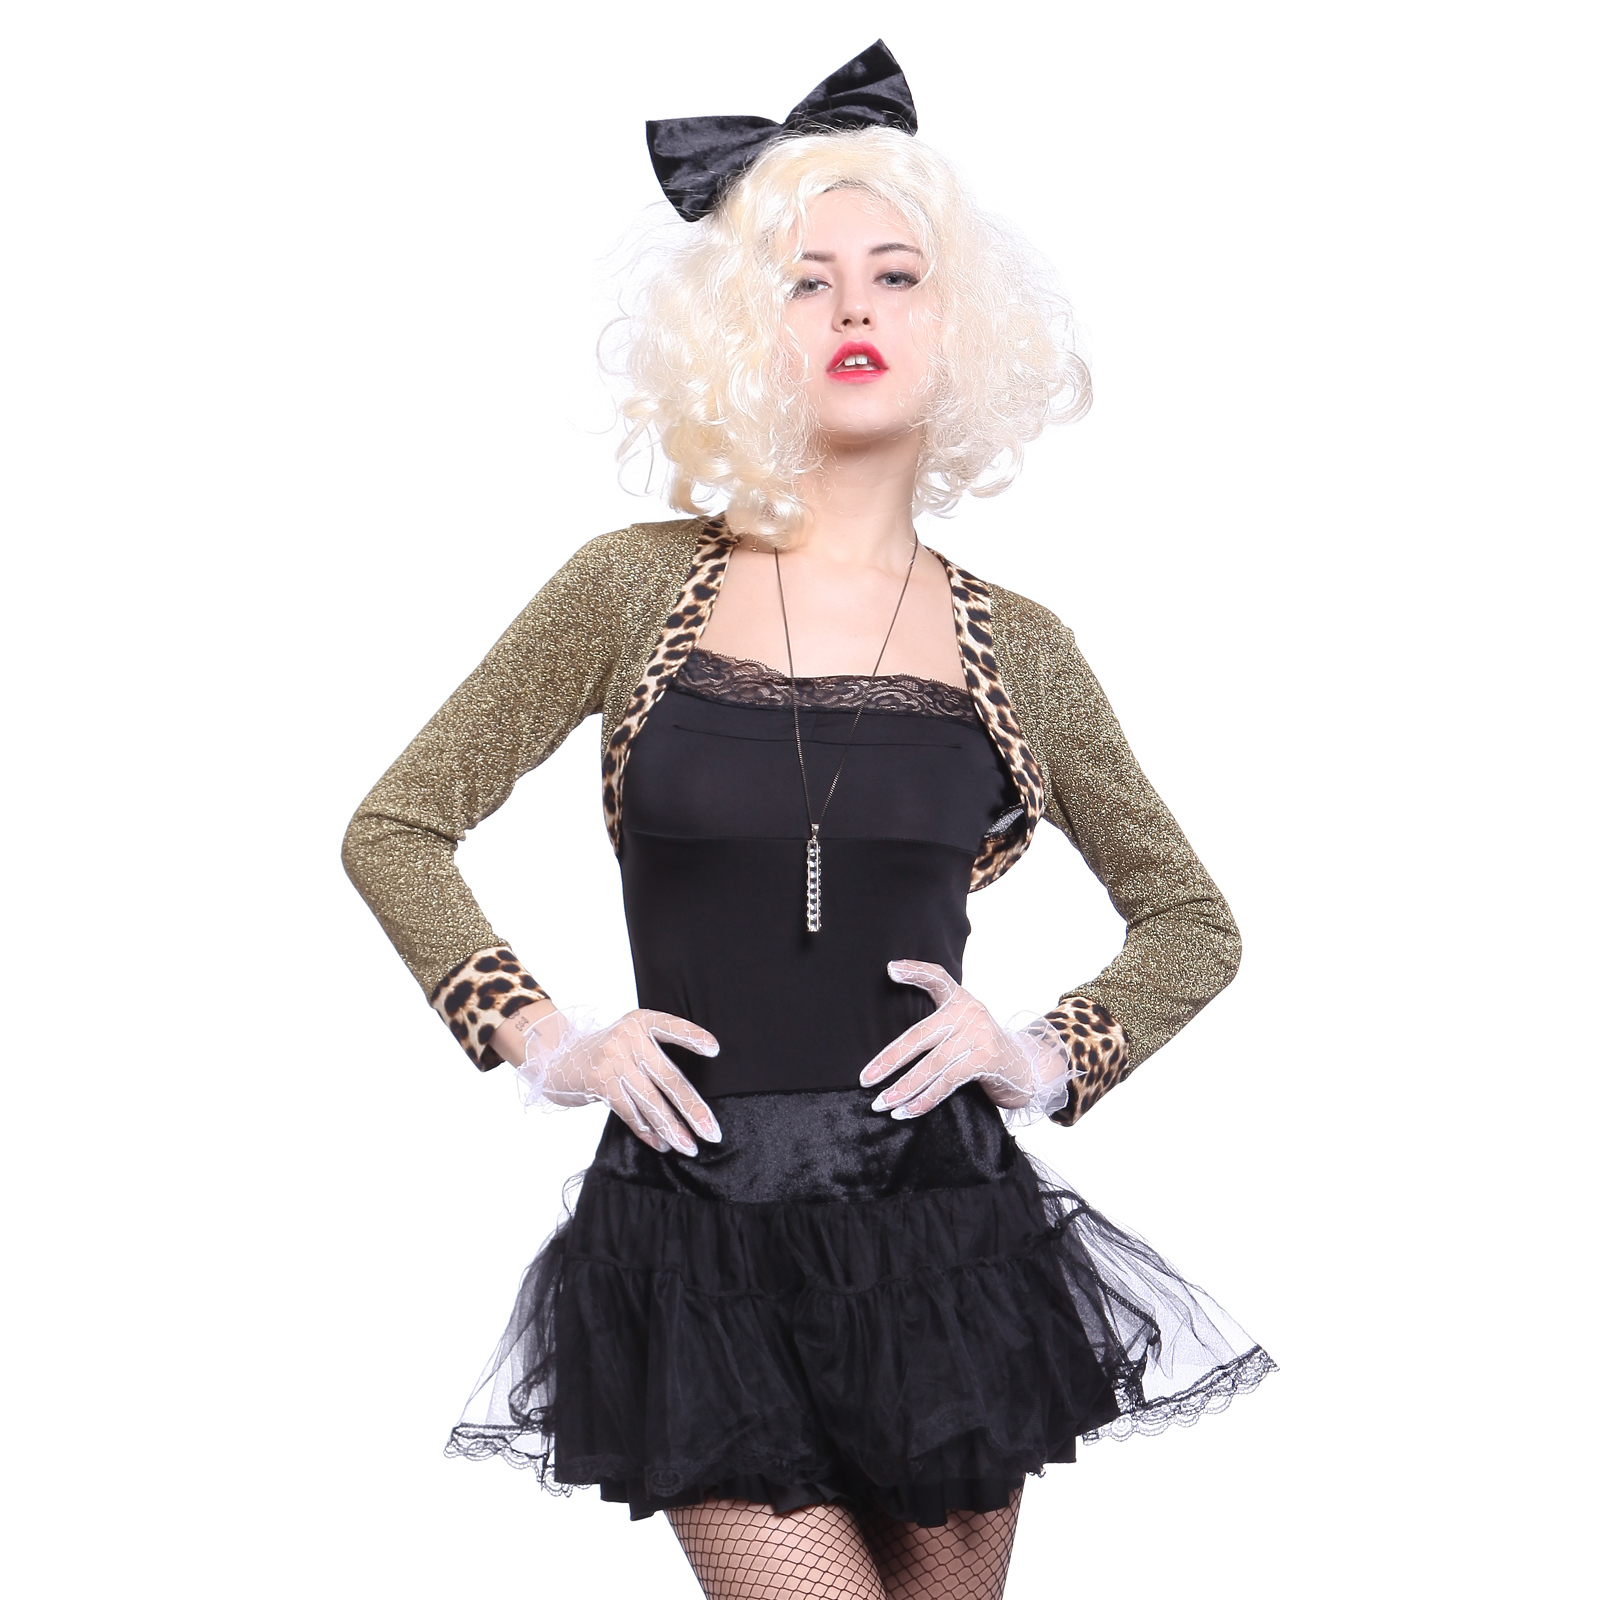 wild child madonna 80s ladies fancy dress 1980s costume. Black Bedroom Furniture Sets. Home Design Ideas